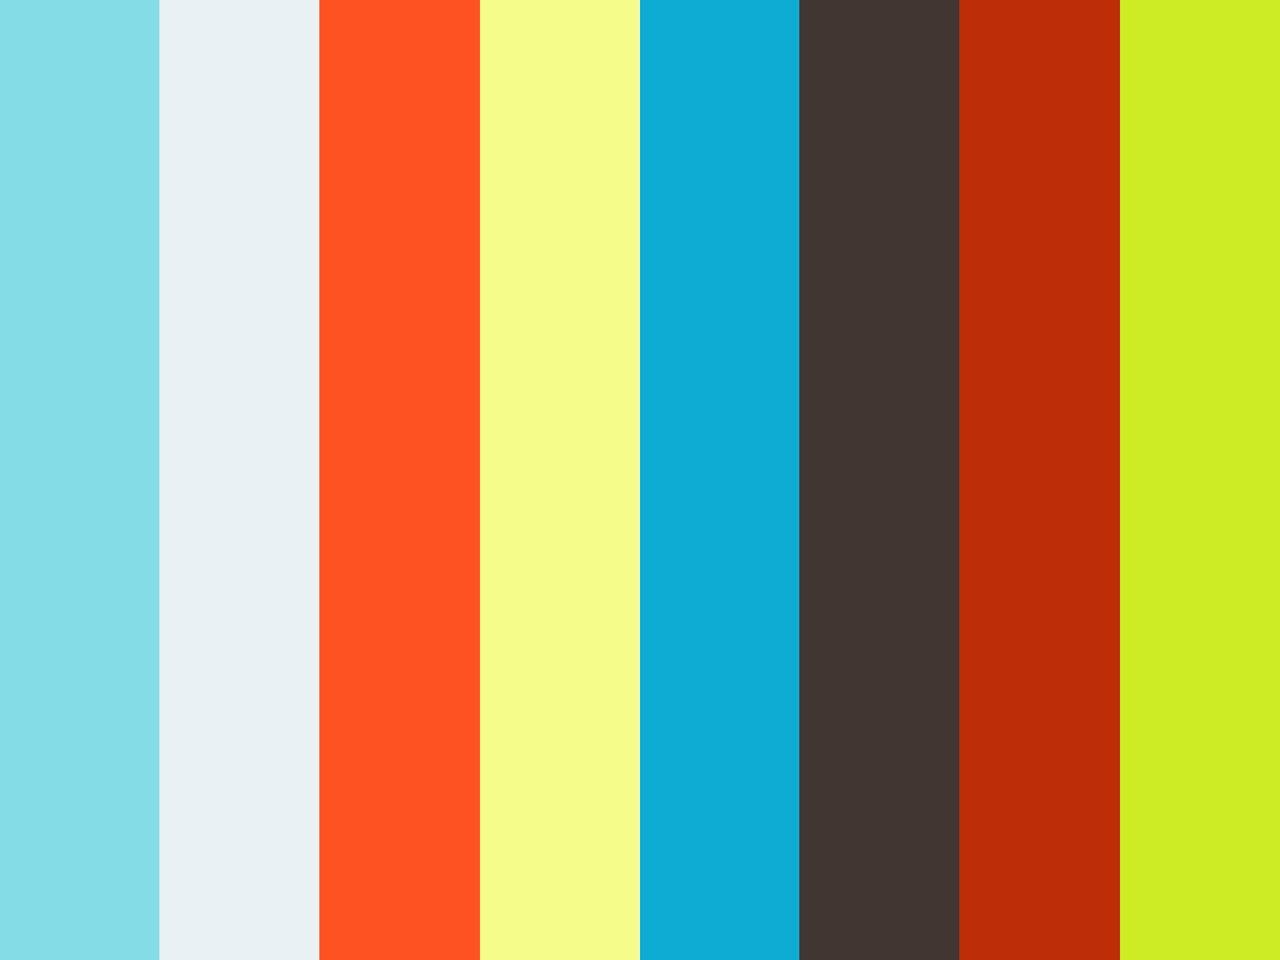 eONE - Filmpremière GVR Kinepolis 16/07/2016